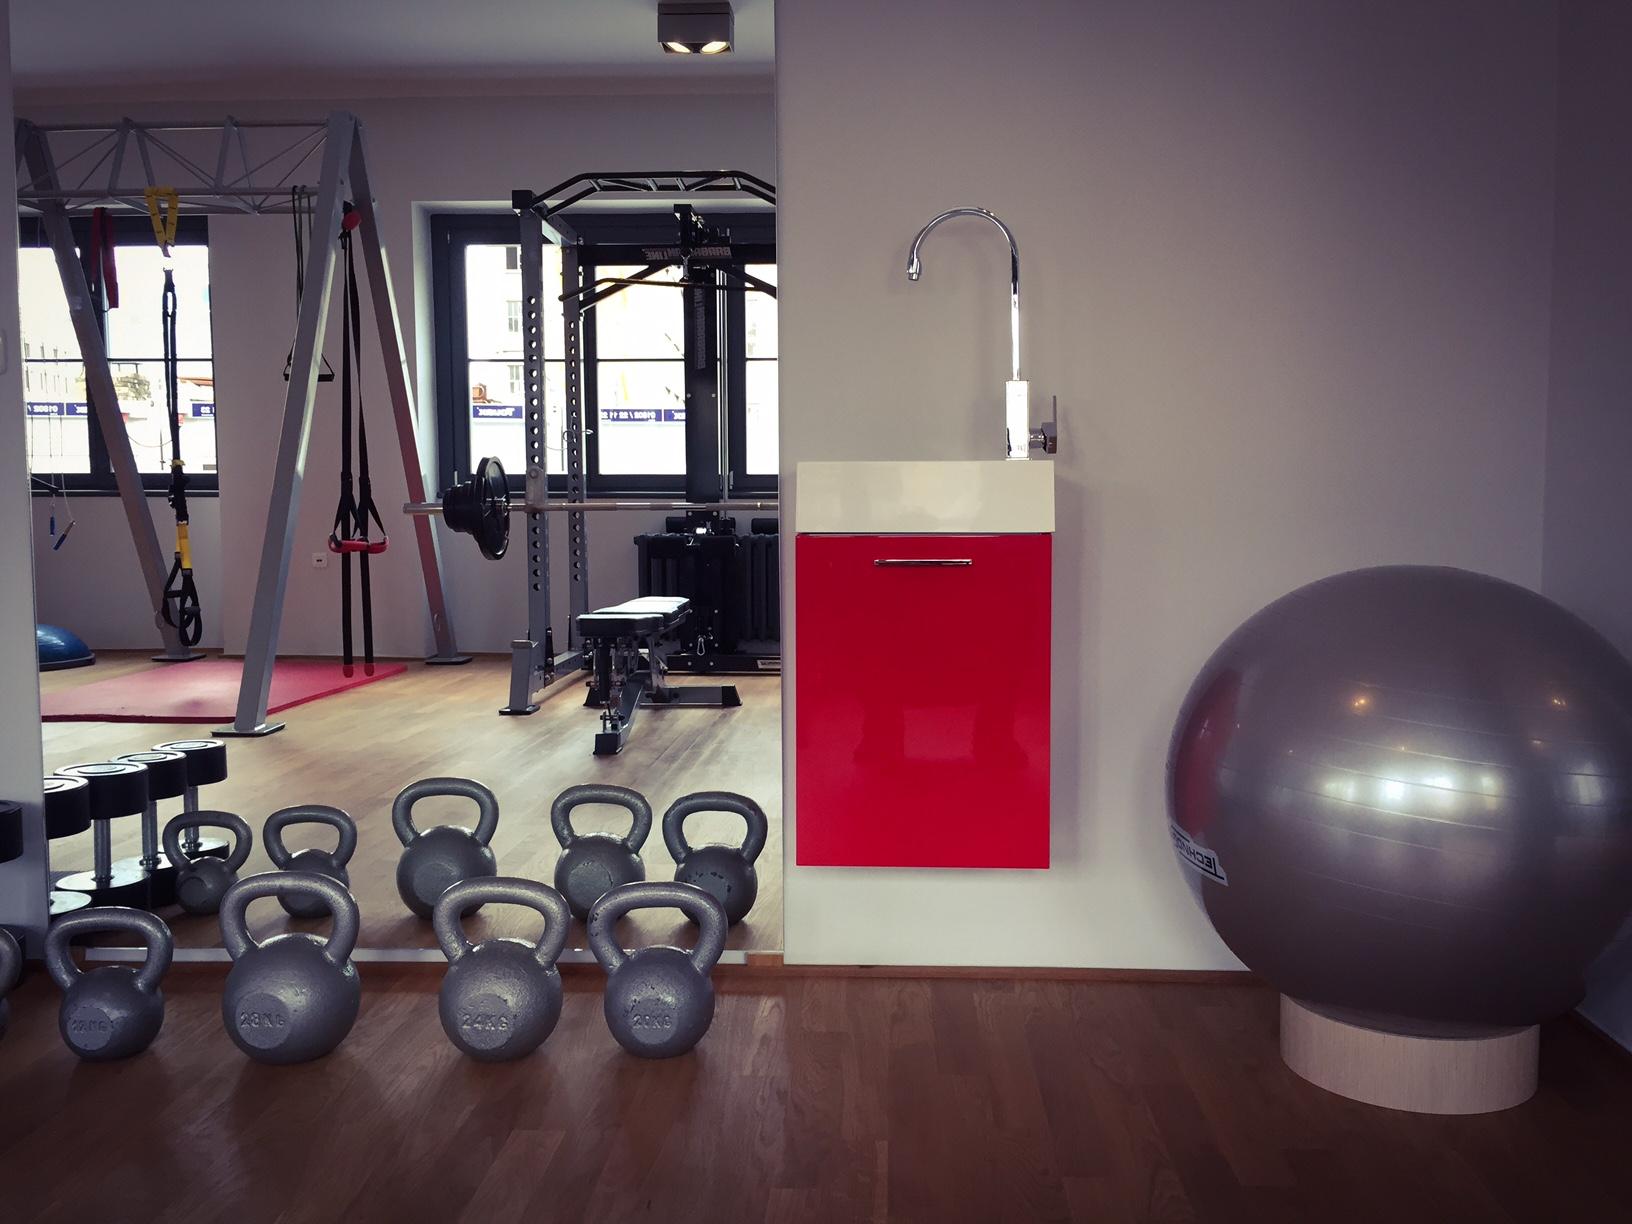 Kettlebells im Personal Training sinnvoll einsetzen